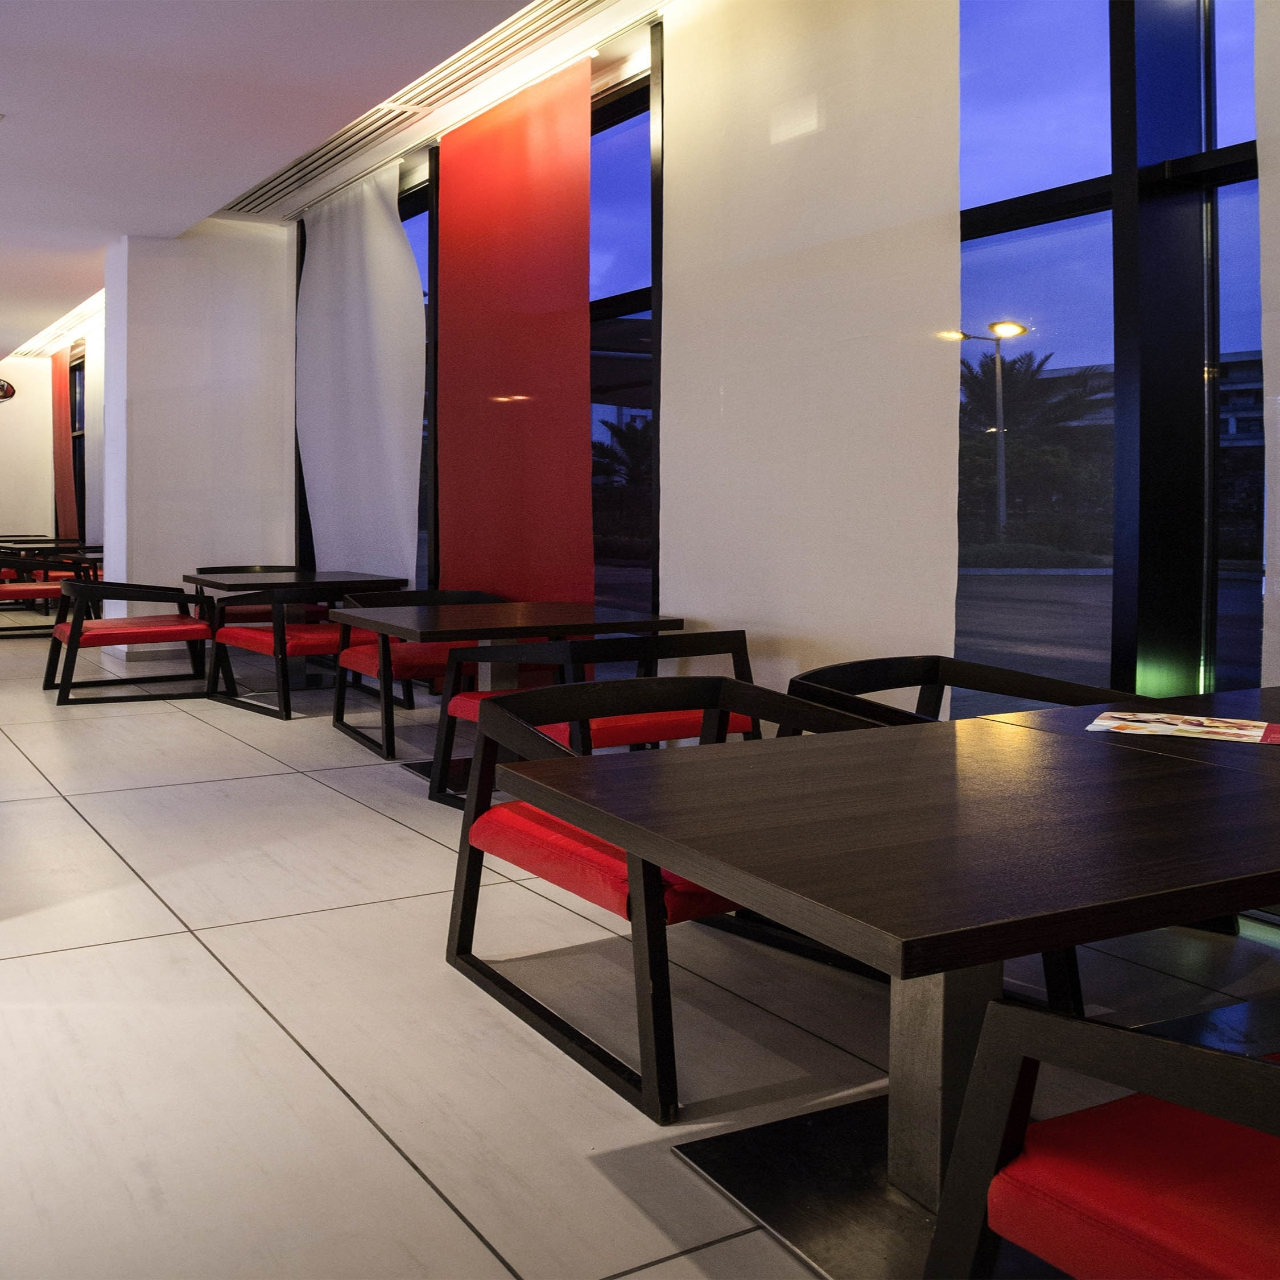 Design Furniture Bab Ezzouar hotel ibis alger aéroport - 3 hrs star hotel in bab ezzouar